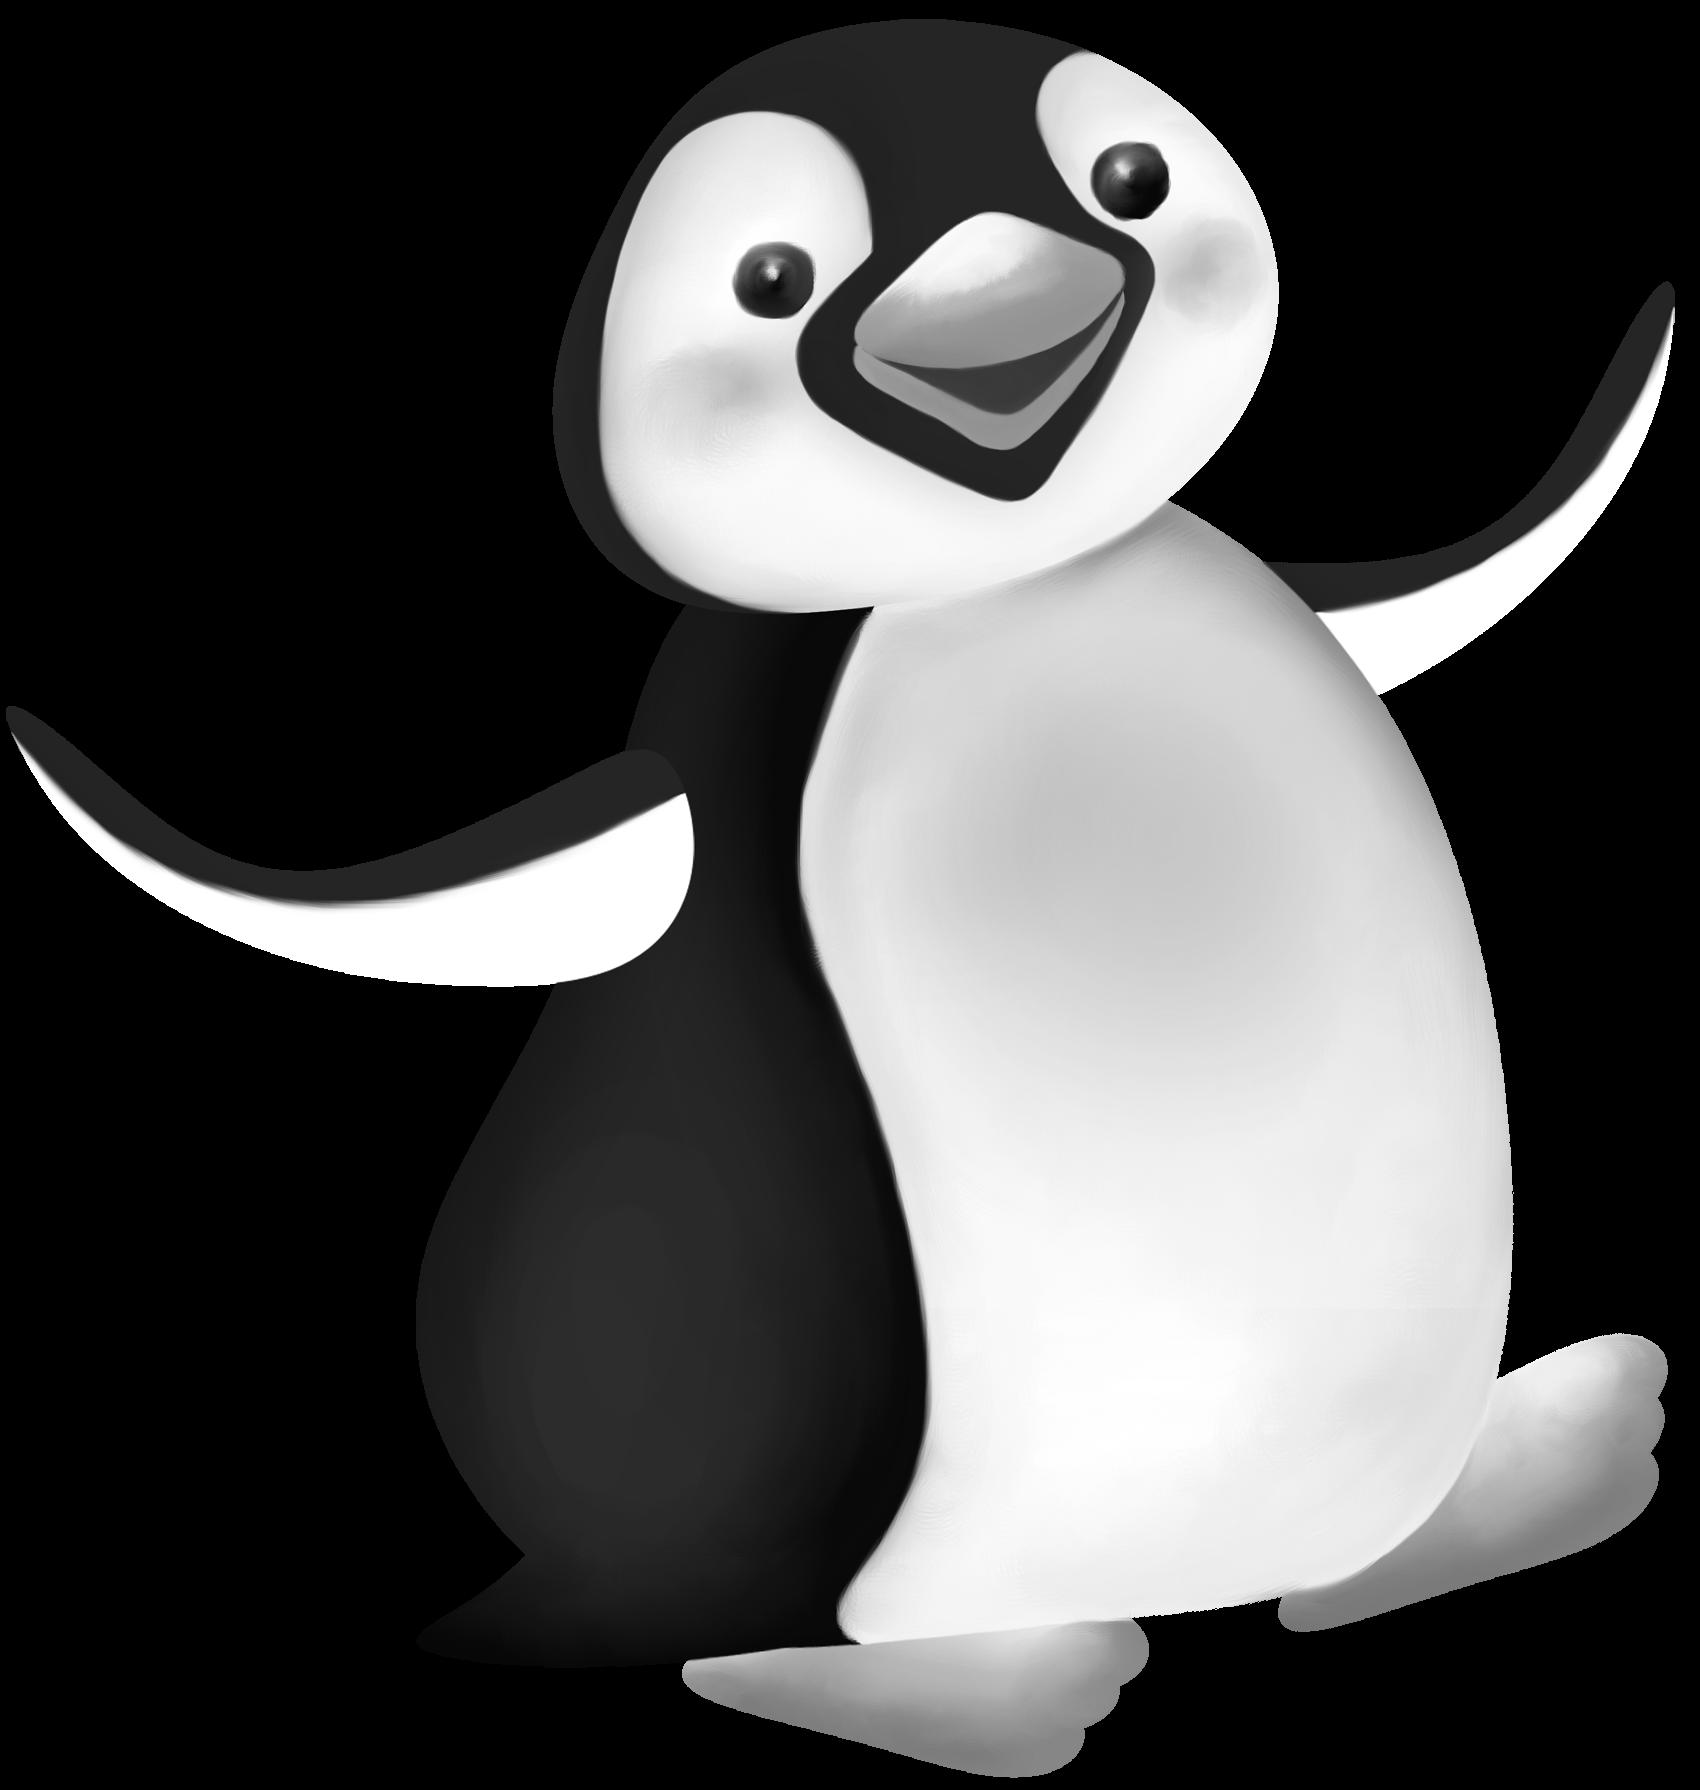 Penguin Clip art Antarctica Illustration Image.